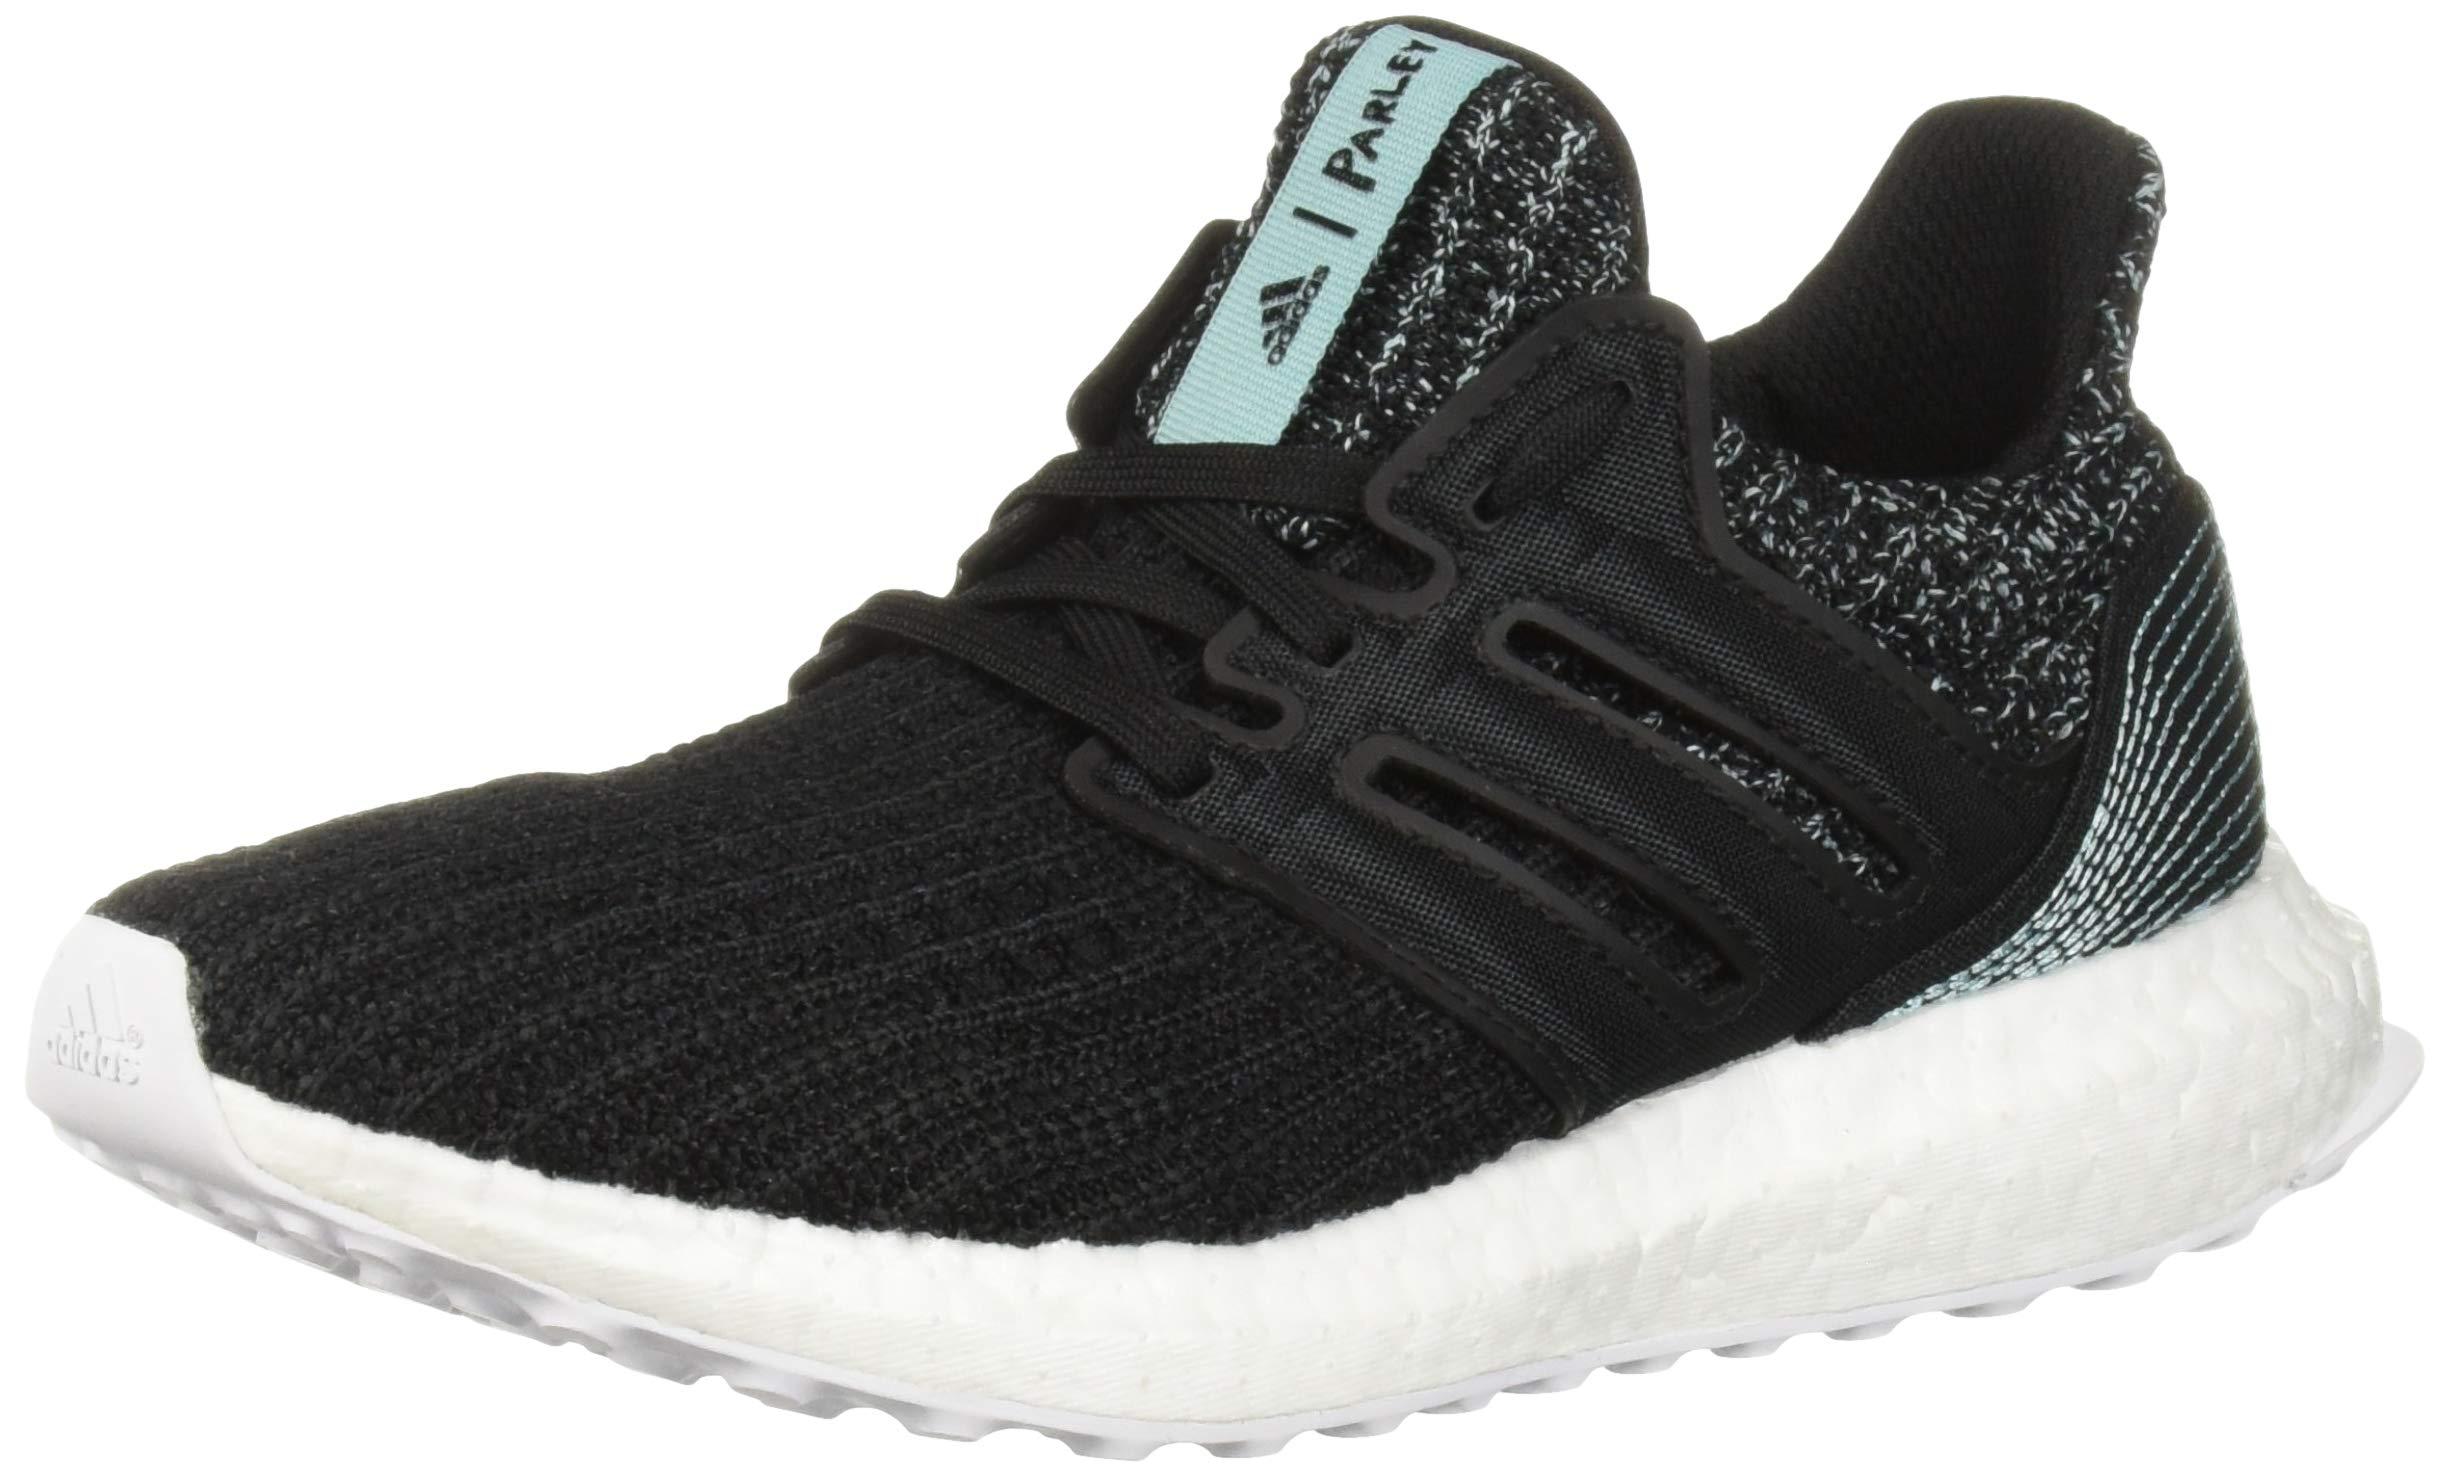 adidas Unisex Ultraboost Parley Running Shoe Black/White, 6 M US Big Kid